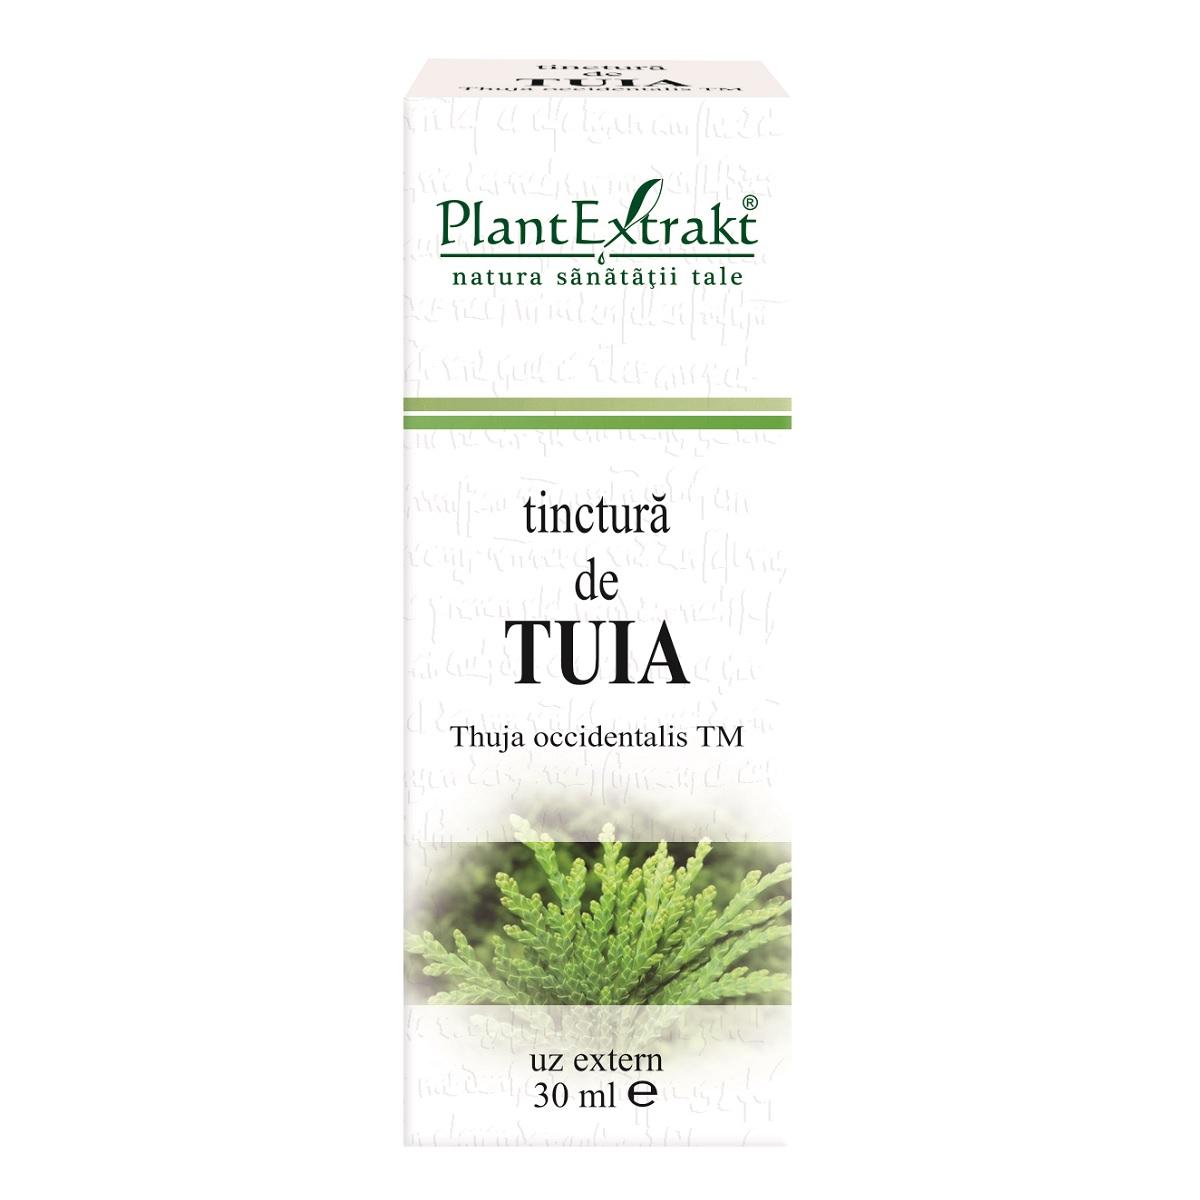 Tinctura de Tuia, 30ml, PlantExtrakt imagine produs 2021